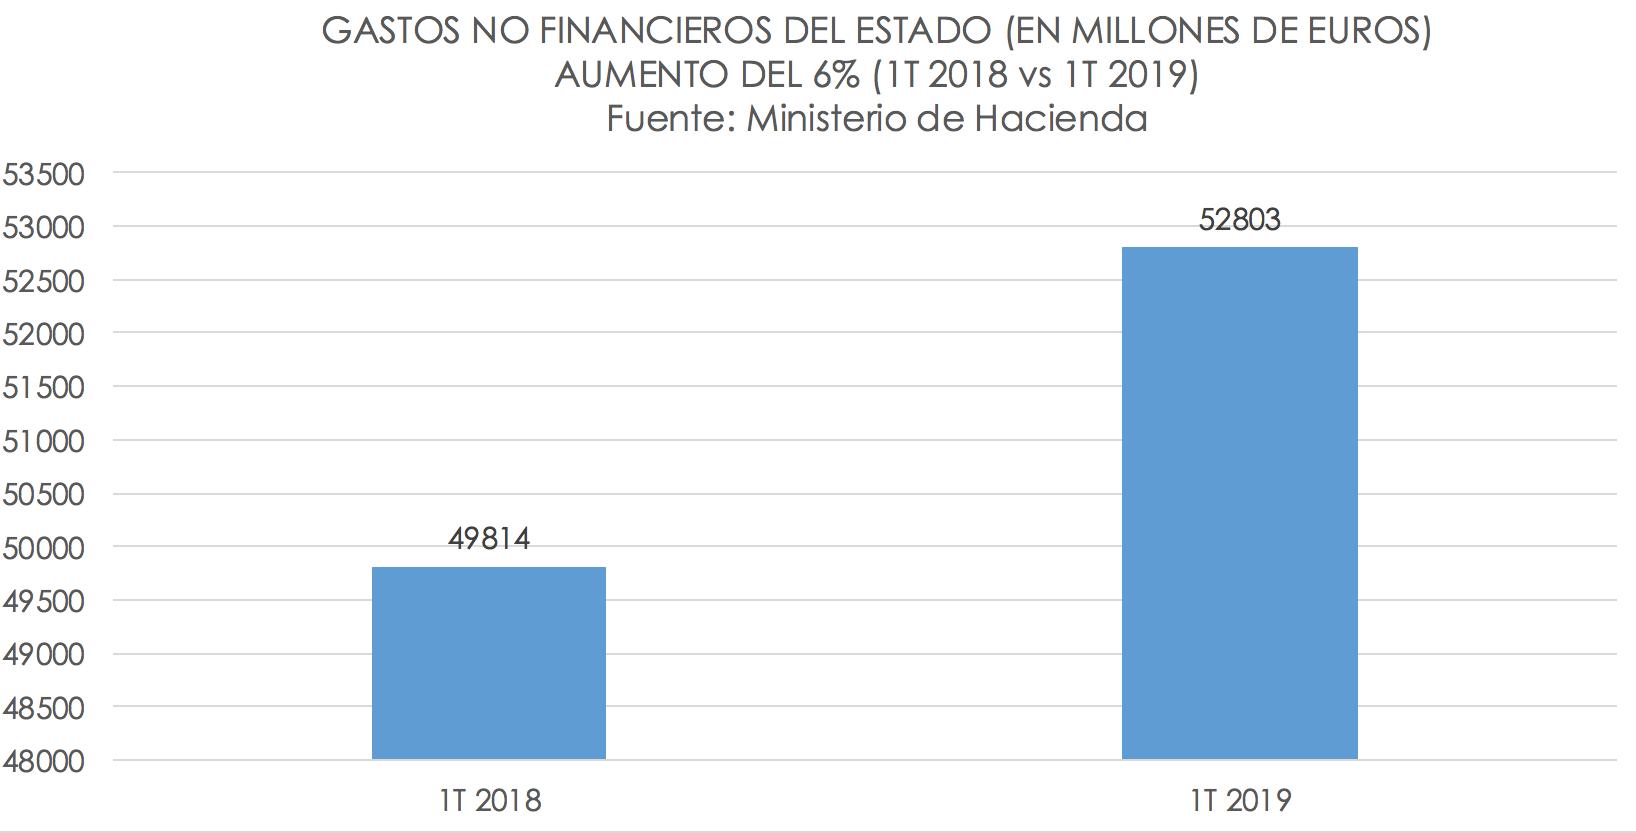 2-aumento-gasto-publico-pedro-sanchez-20